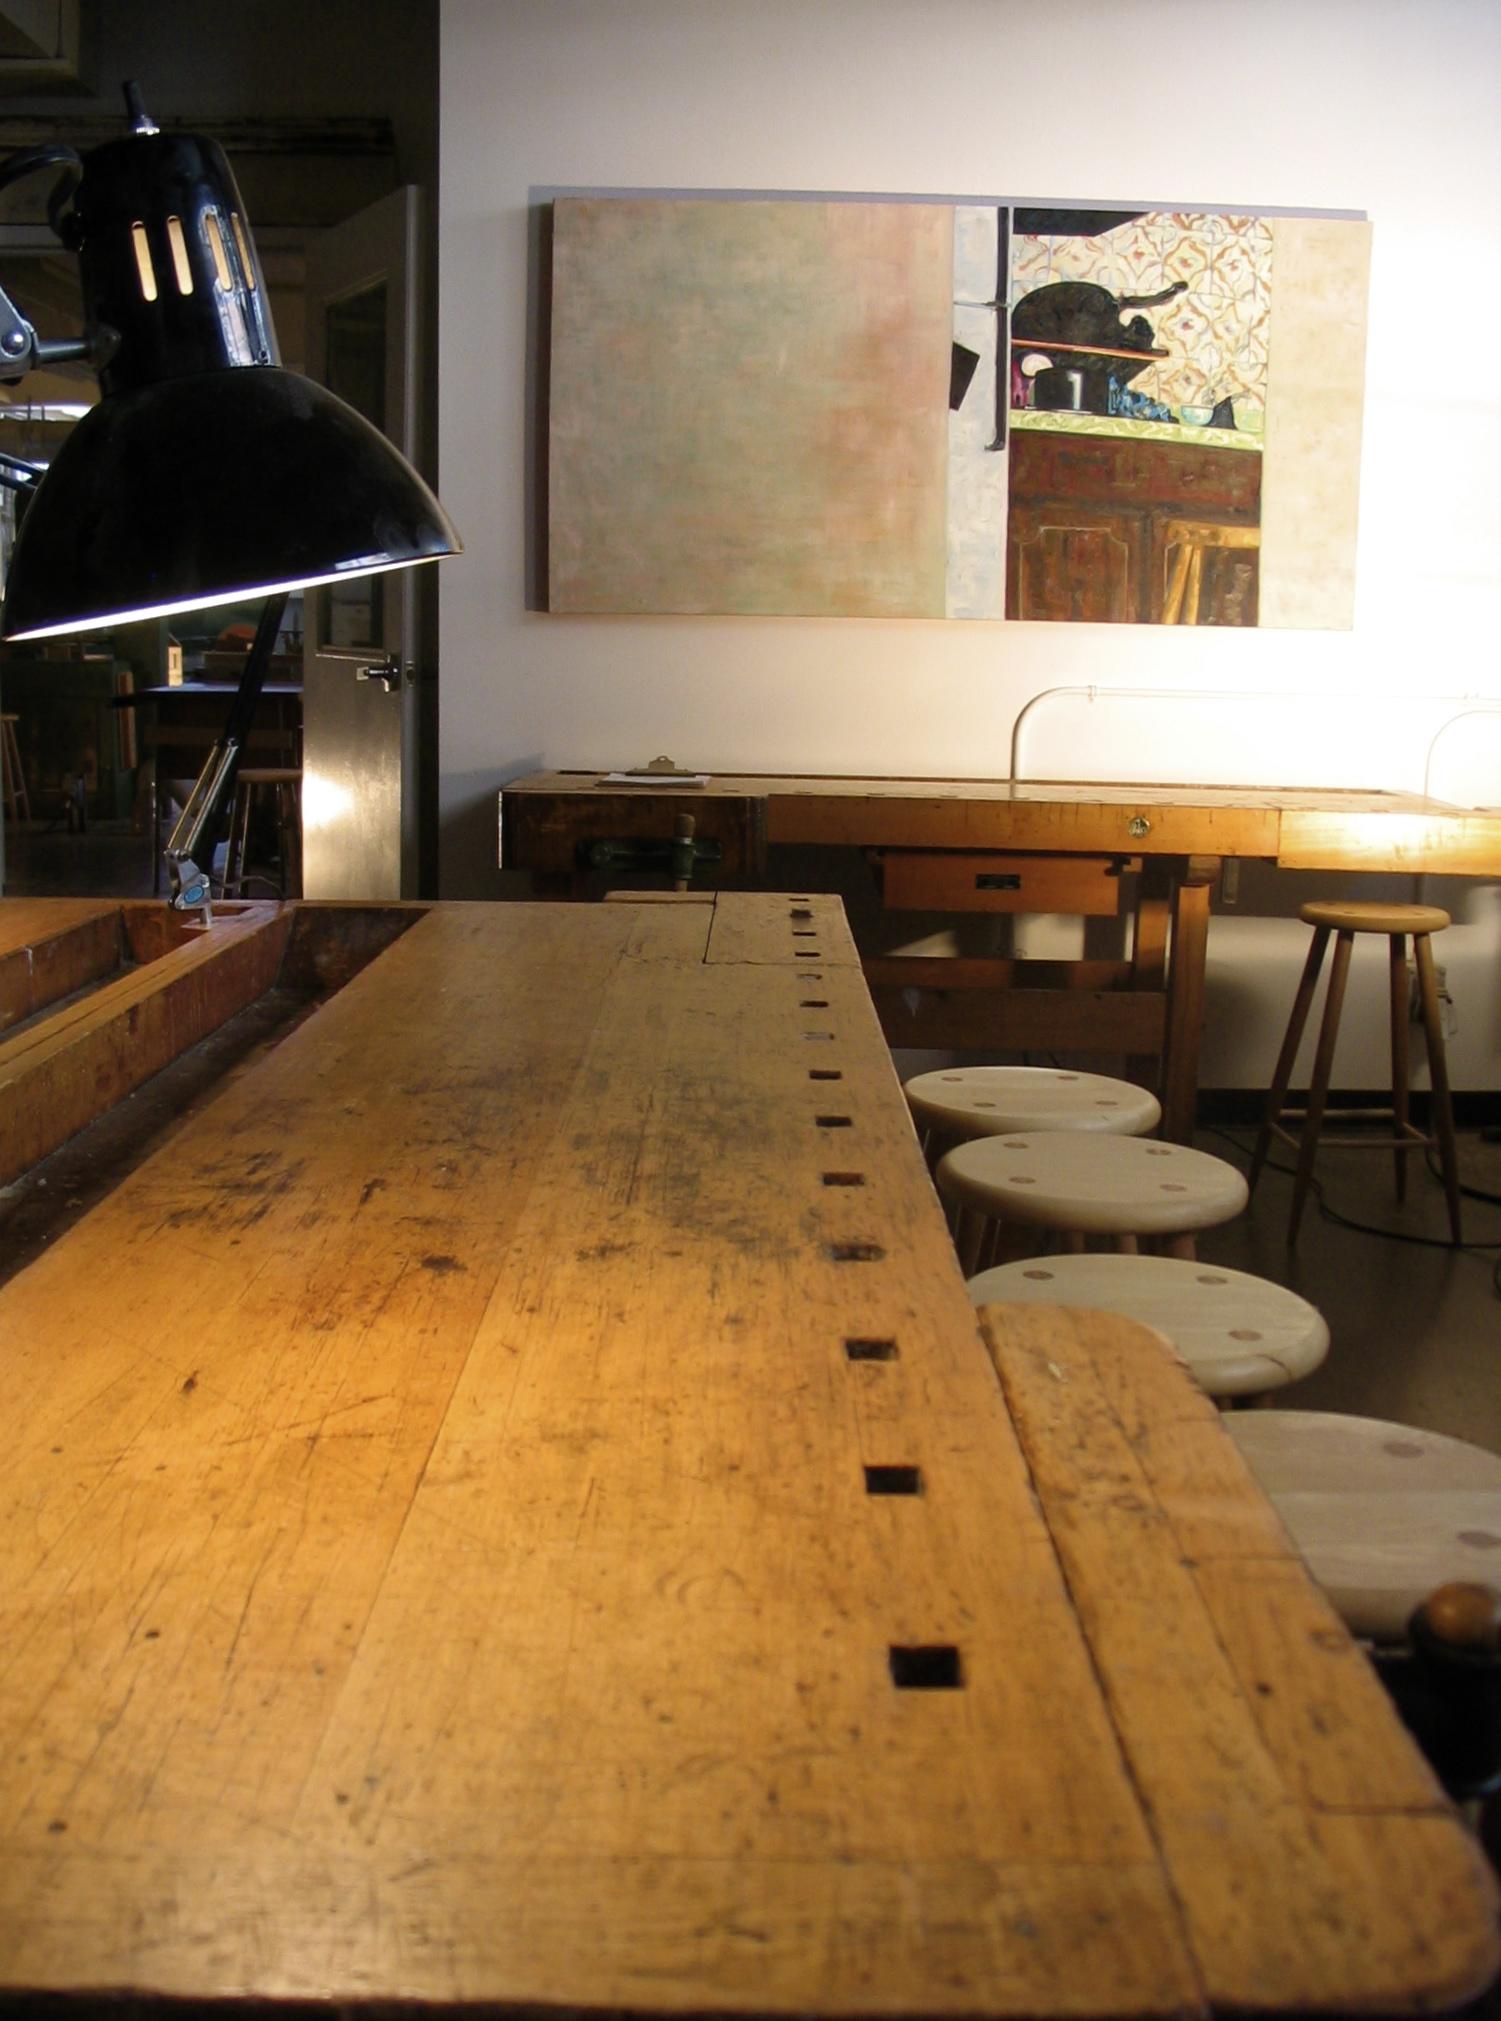 Jobs woodworking craft in sc | row crosman woodworking' - 'feed speed ...